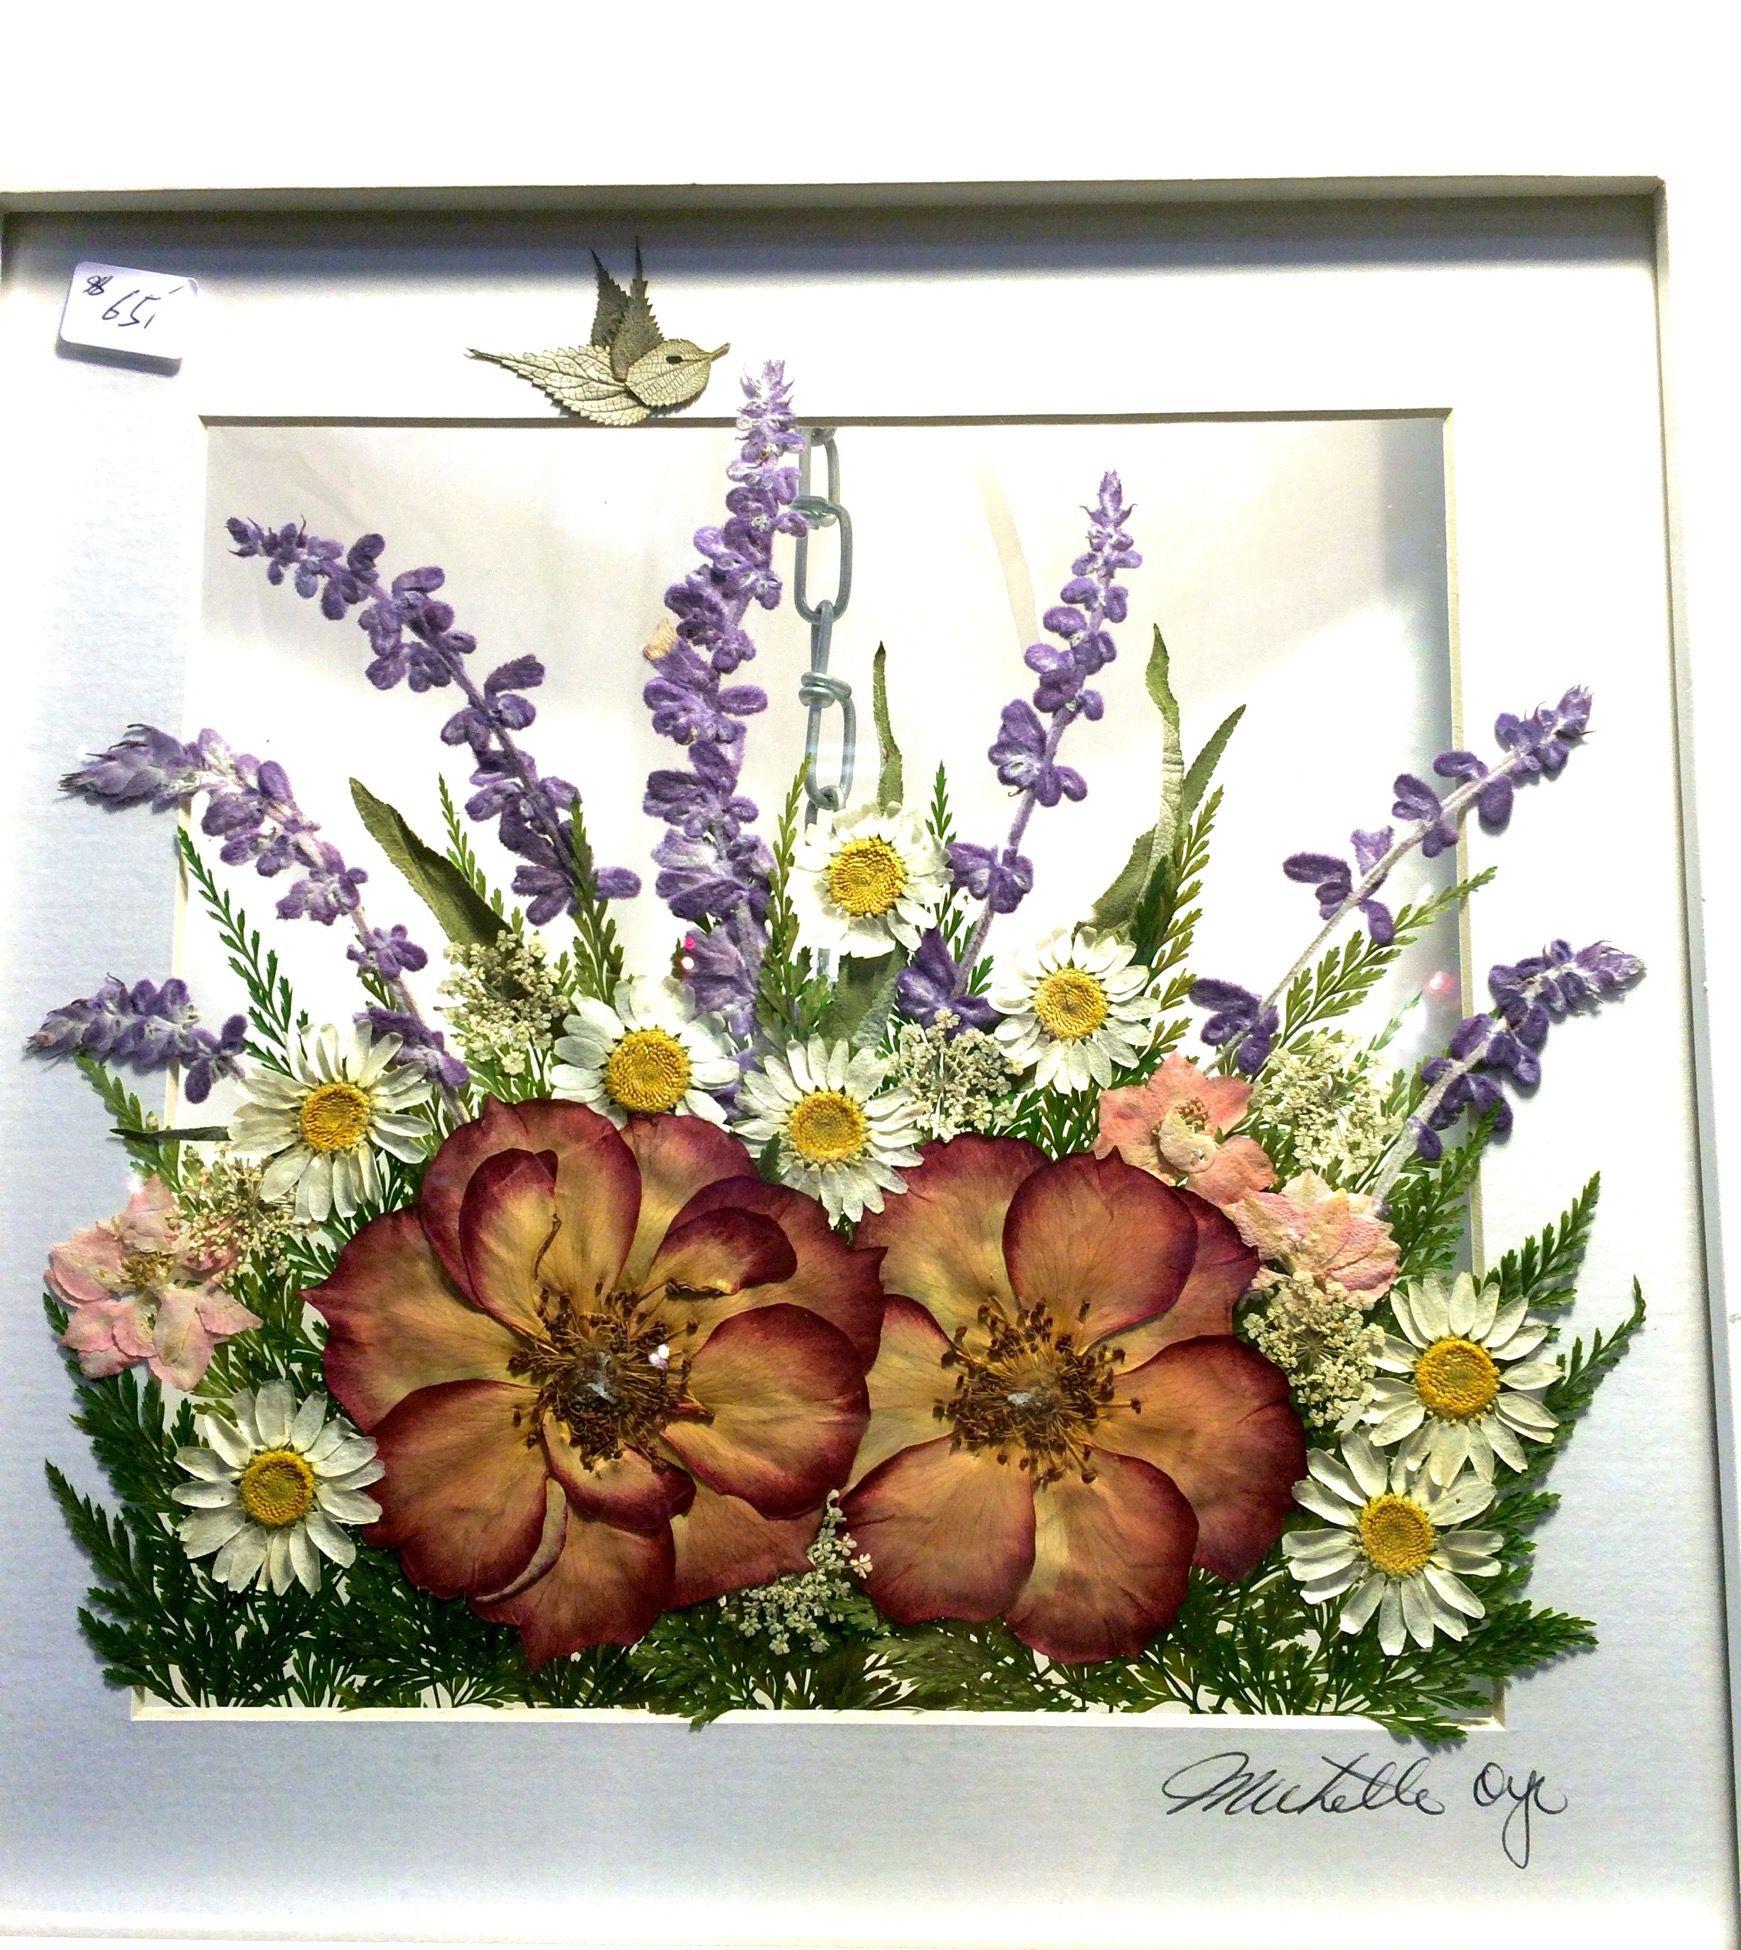 Philadelphia flower show brings spring weather